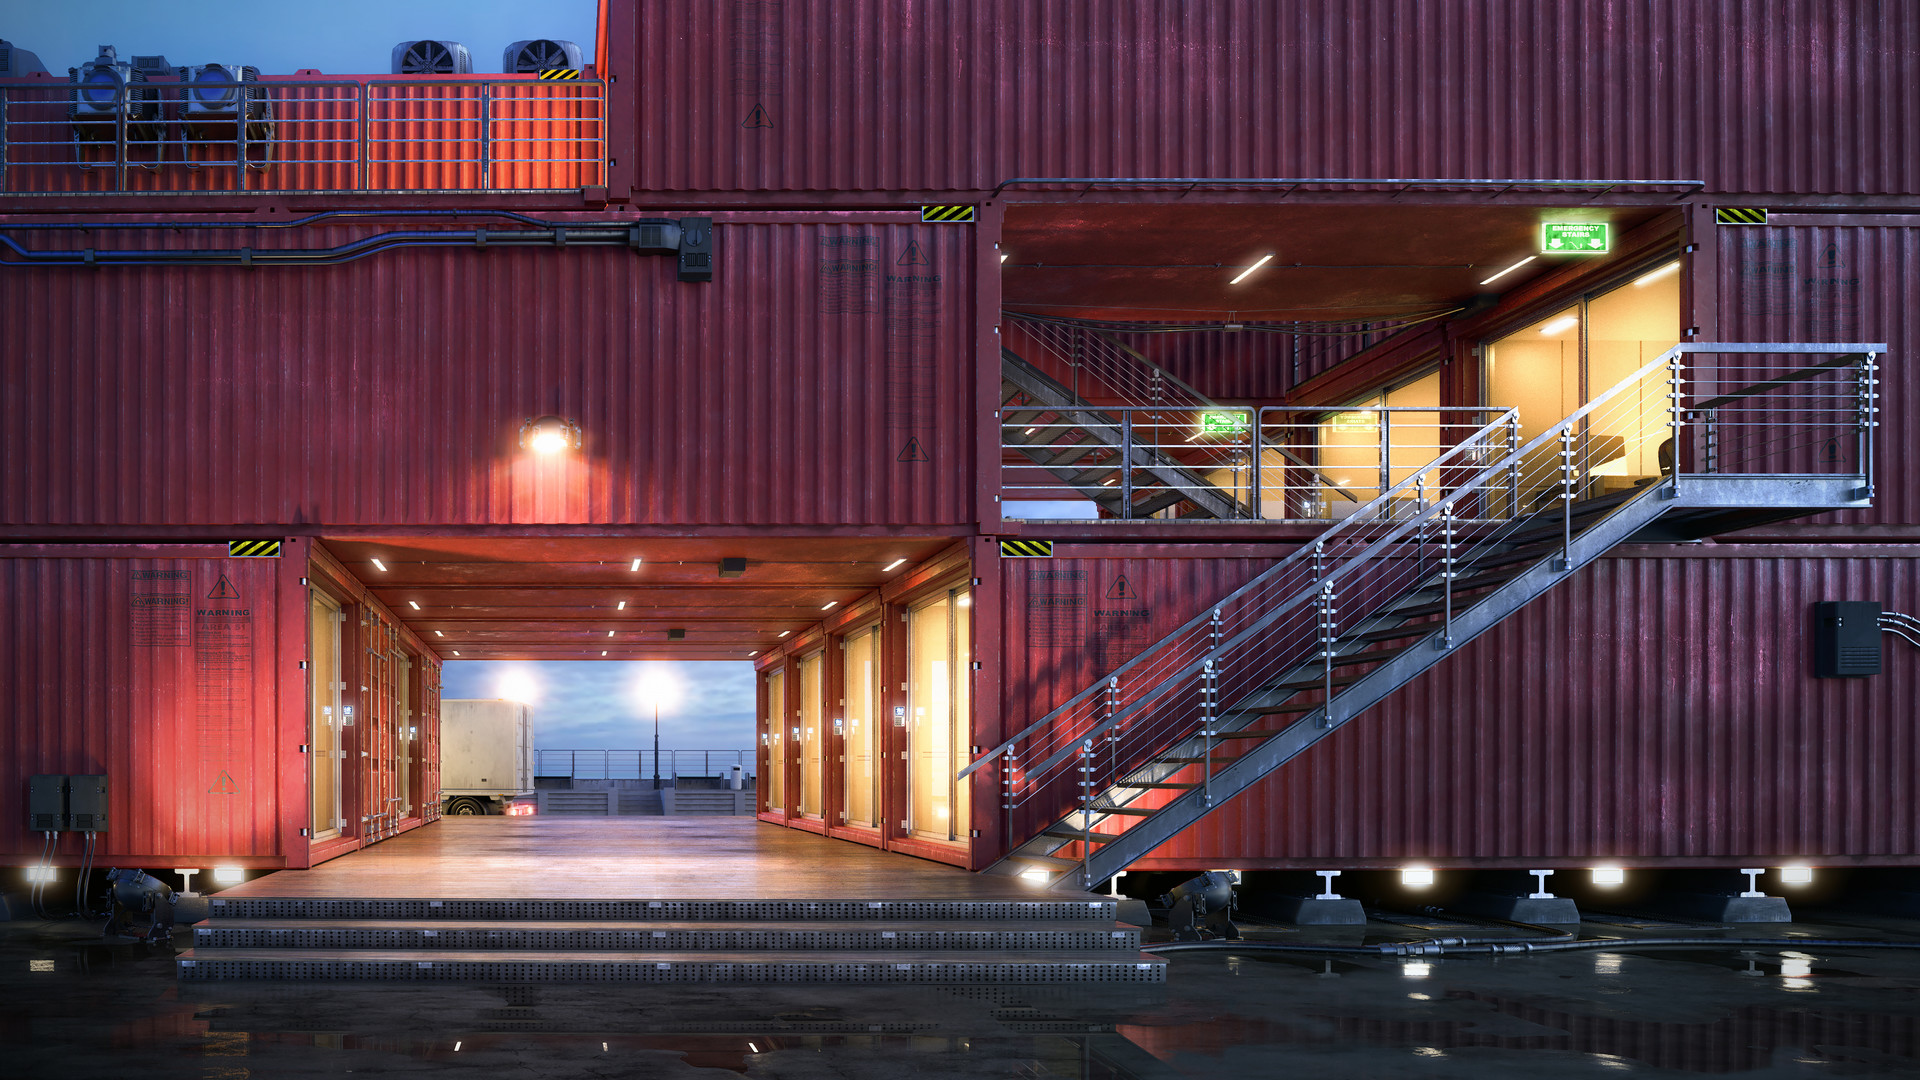 Mateusz wielgus containers4k final1d